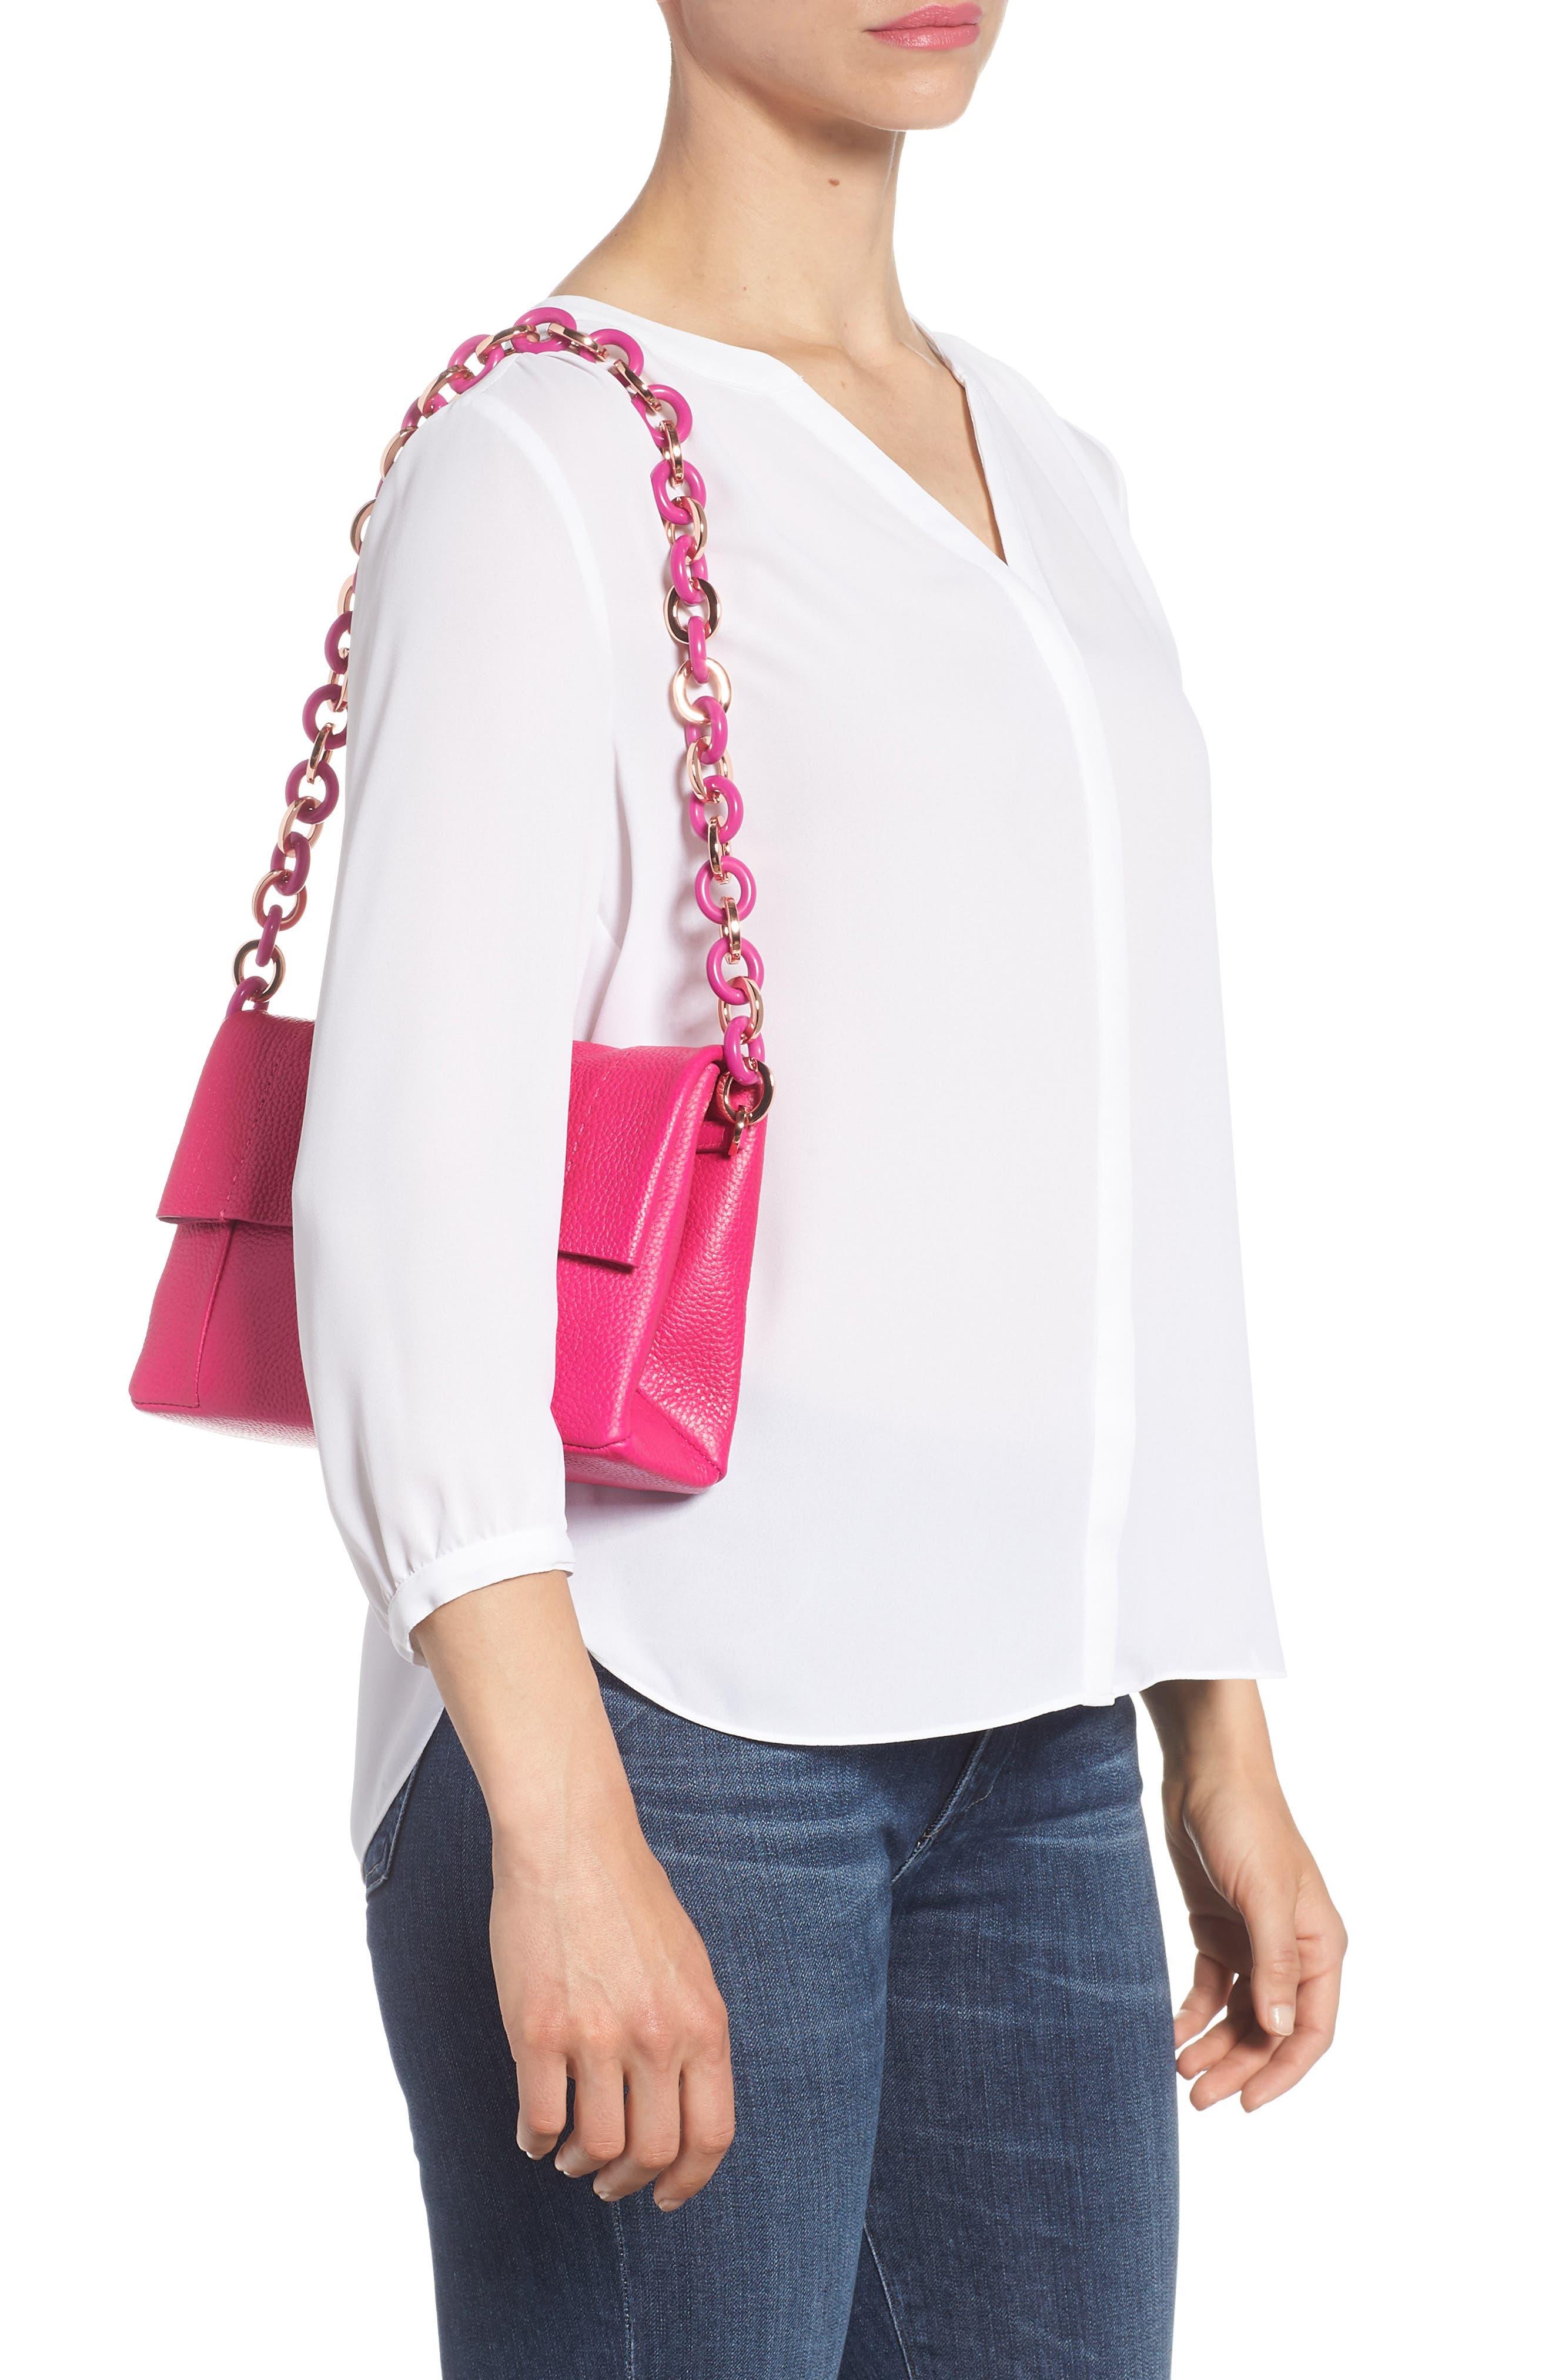 Ipomoea Leather Shoulder Bag,                             Alternate thumbnail 2, color,                             Fuchsia